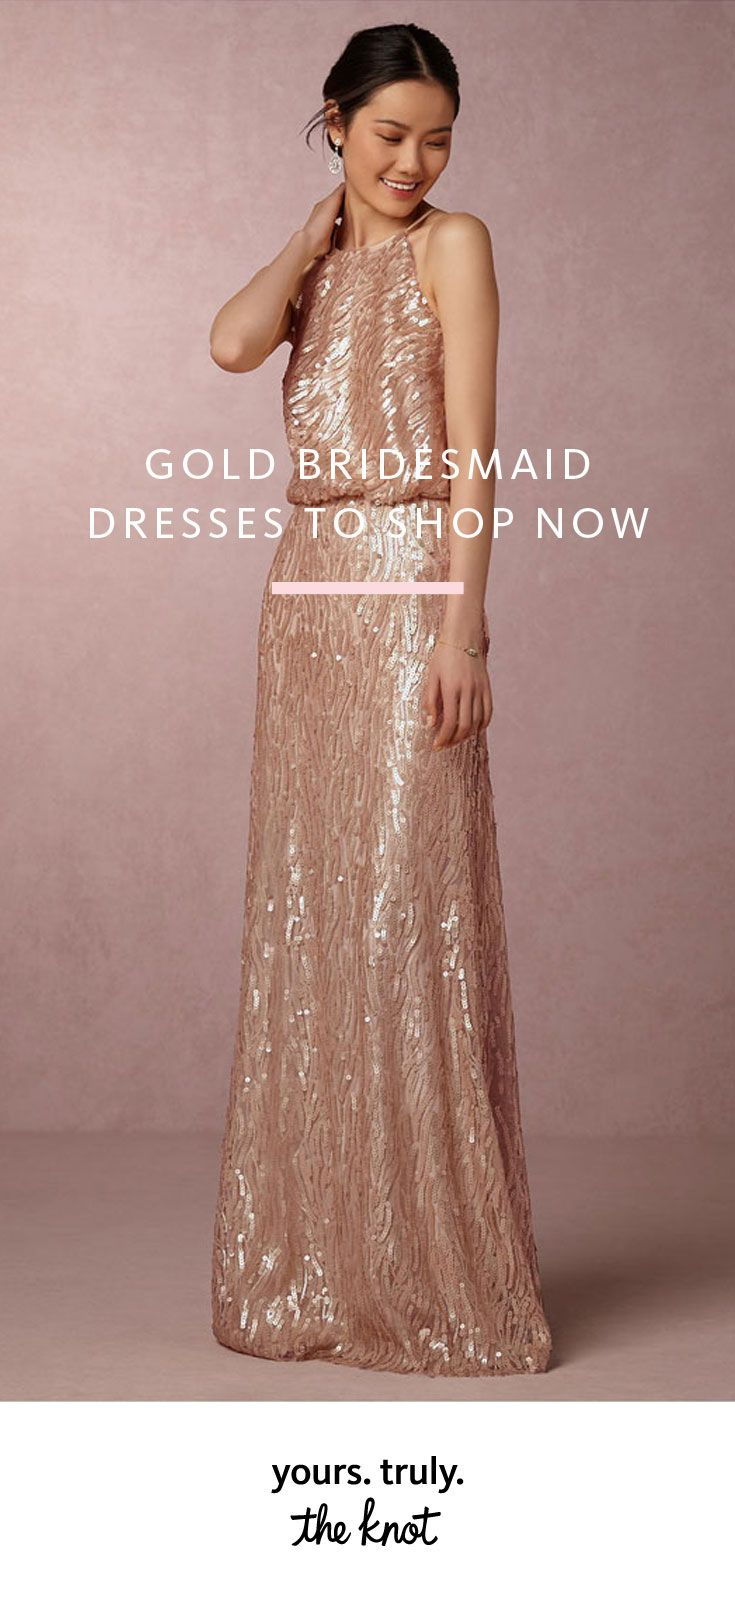 Beaded, Metallic, and Sequined Bridesmaid Dresses | Dresses dresses ...